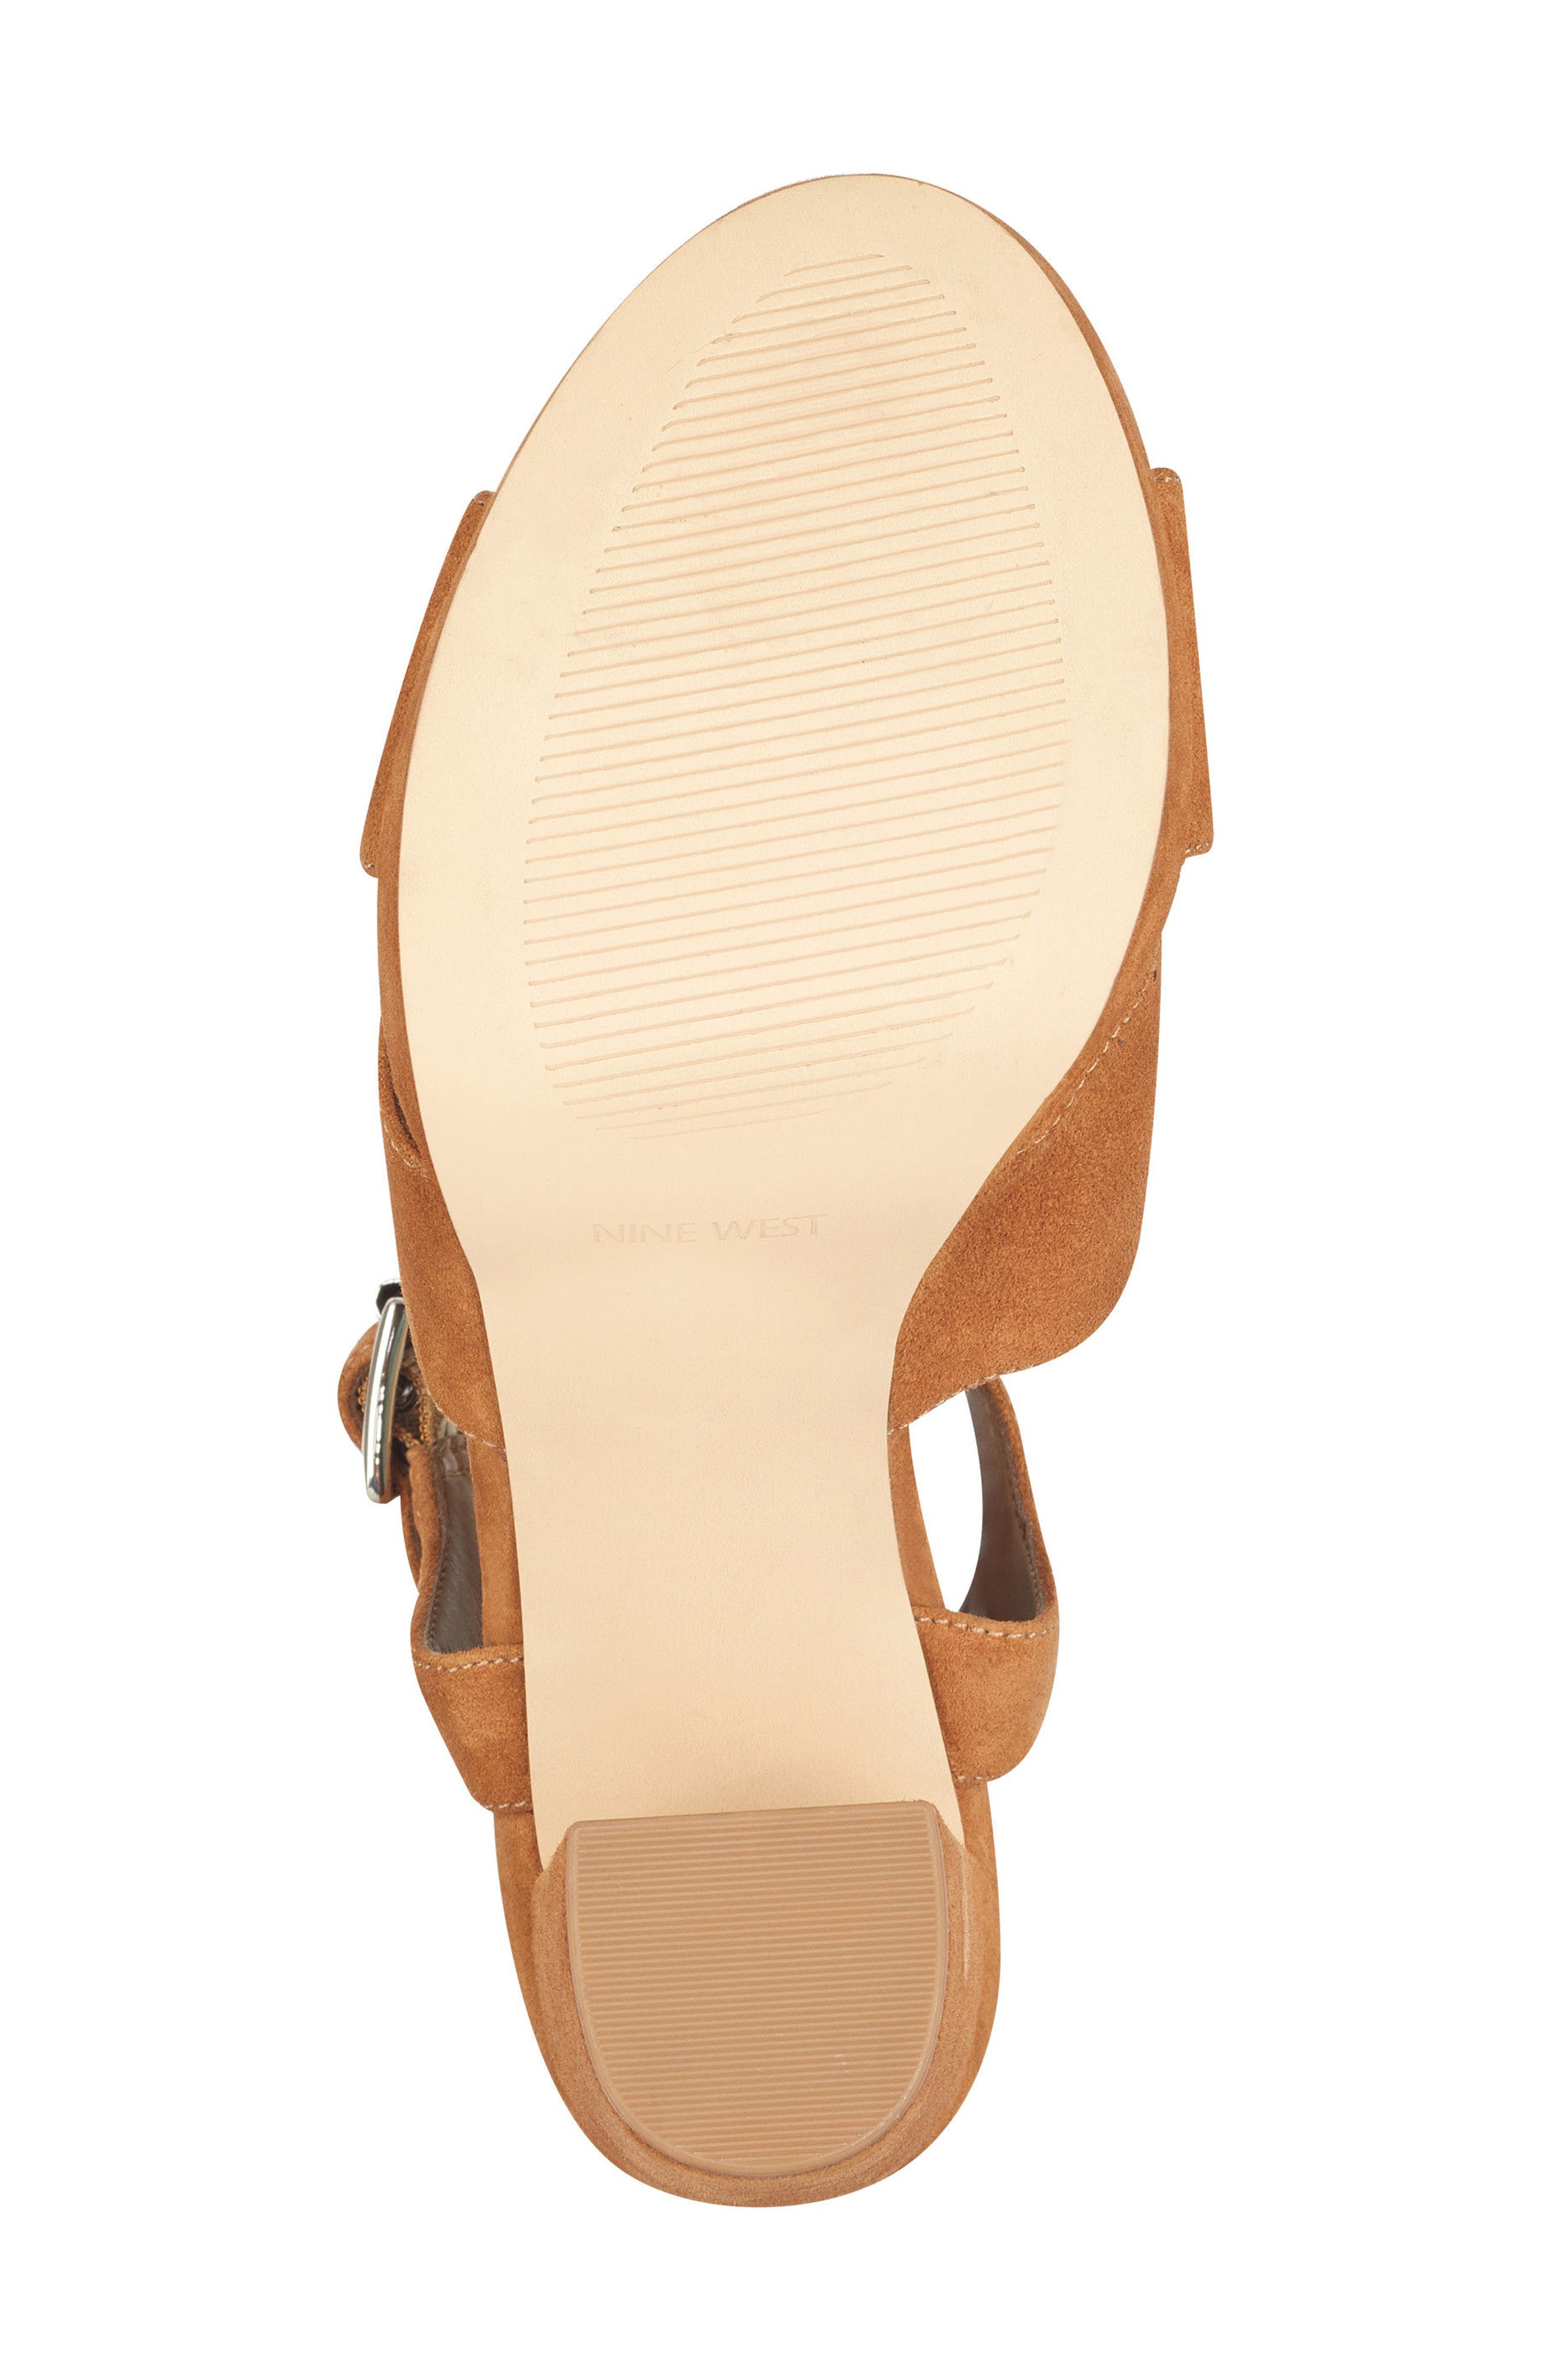 Jimar Platform Sandal,                             Alternate thumbnail 6, color,                             DARK NATURAL SUEDE